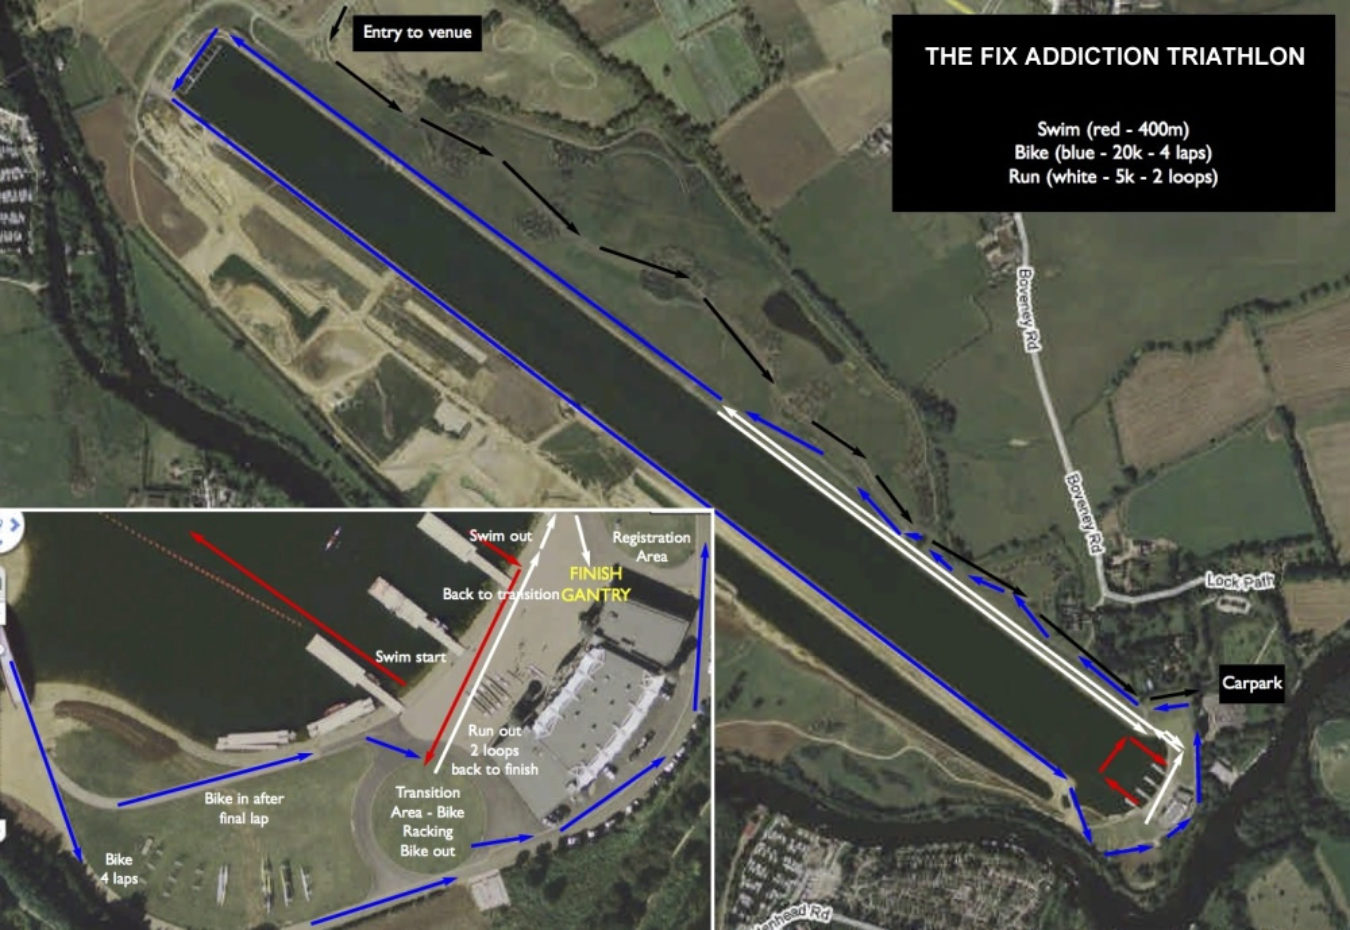 The Fix Addiction Triathlon 2015